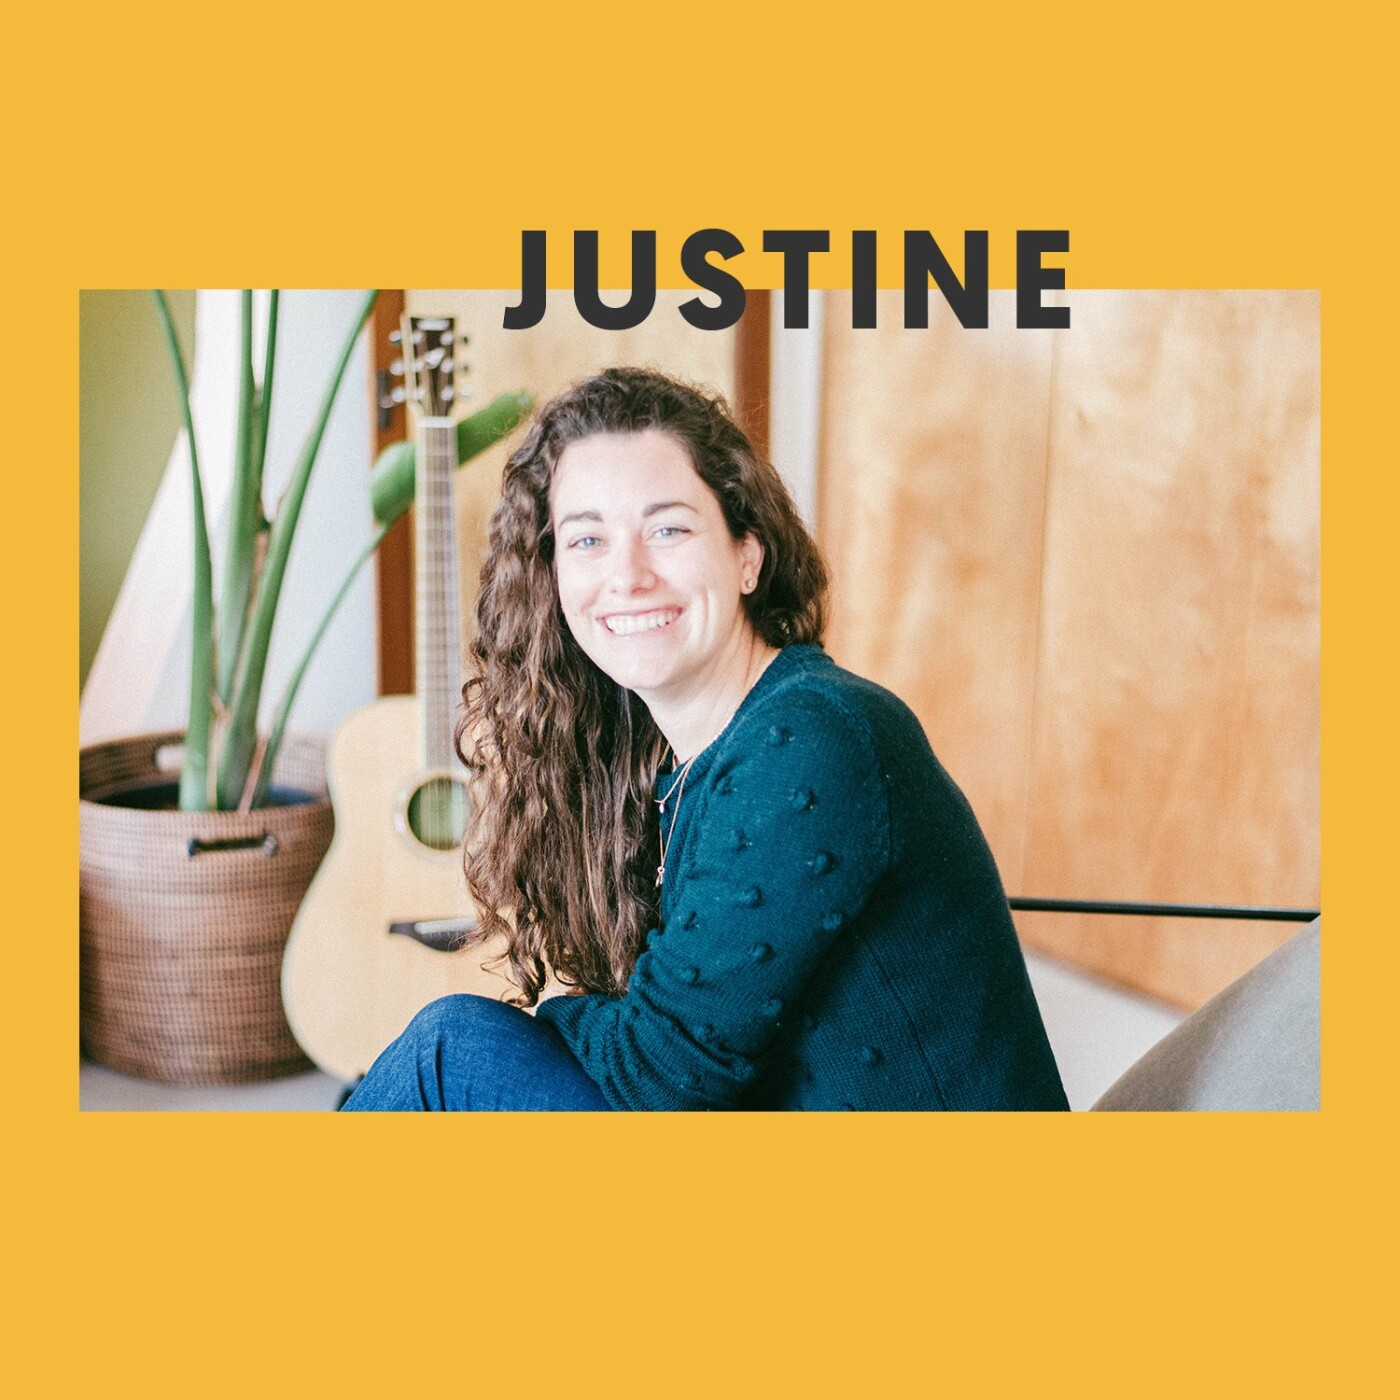 45 • Justine